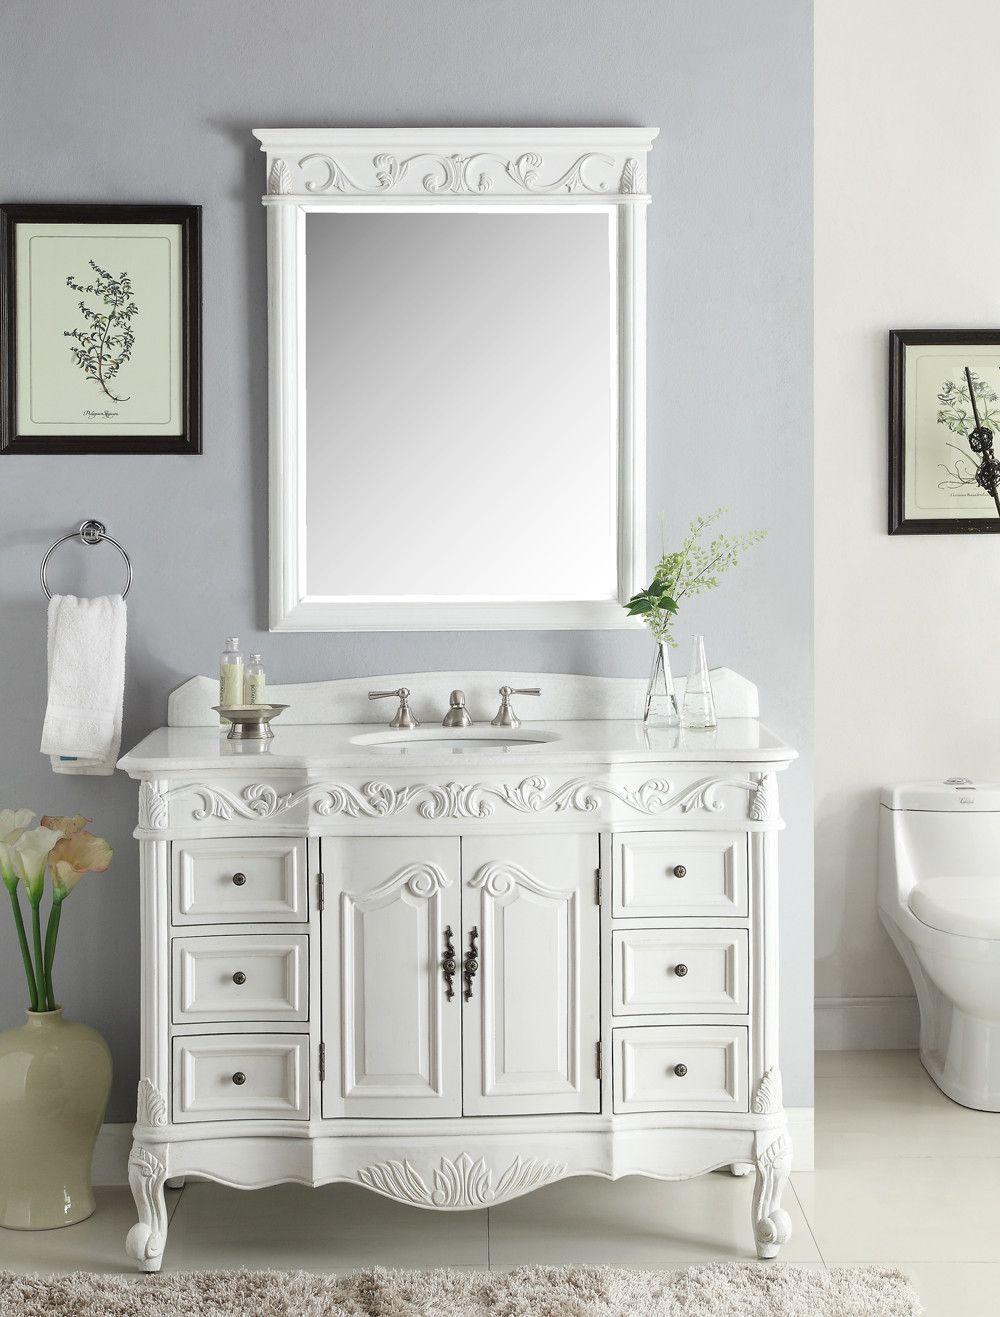 Inspirational Vintage Bathroom Vanity Mirrors